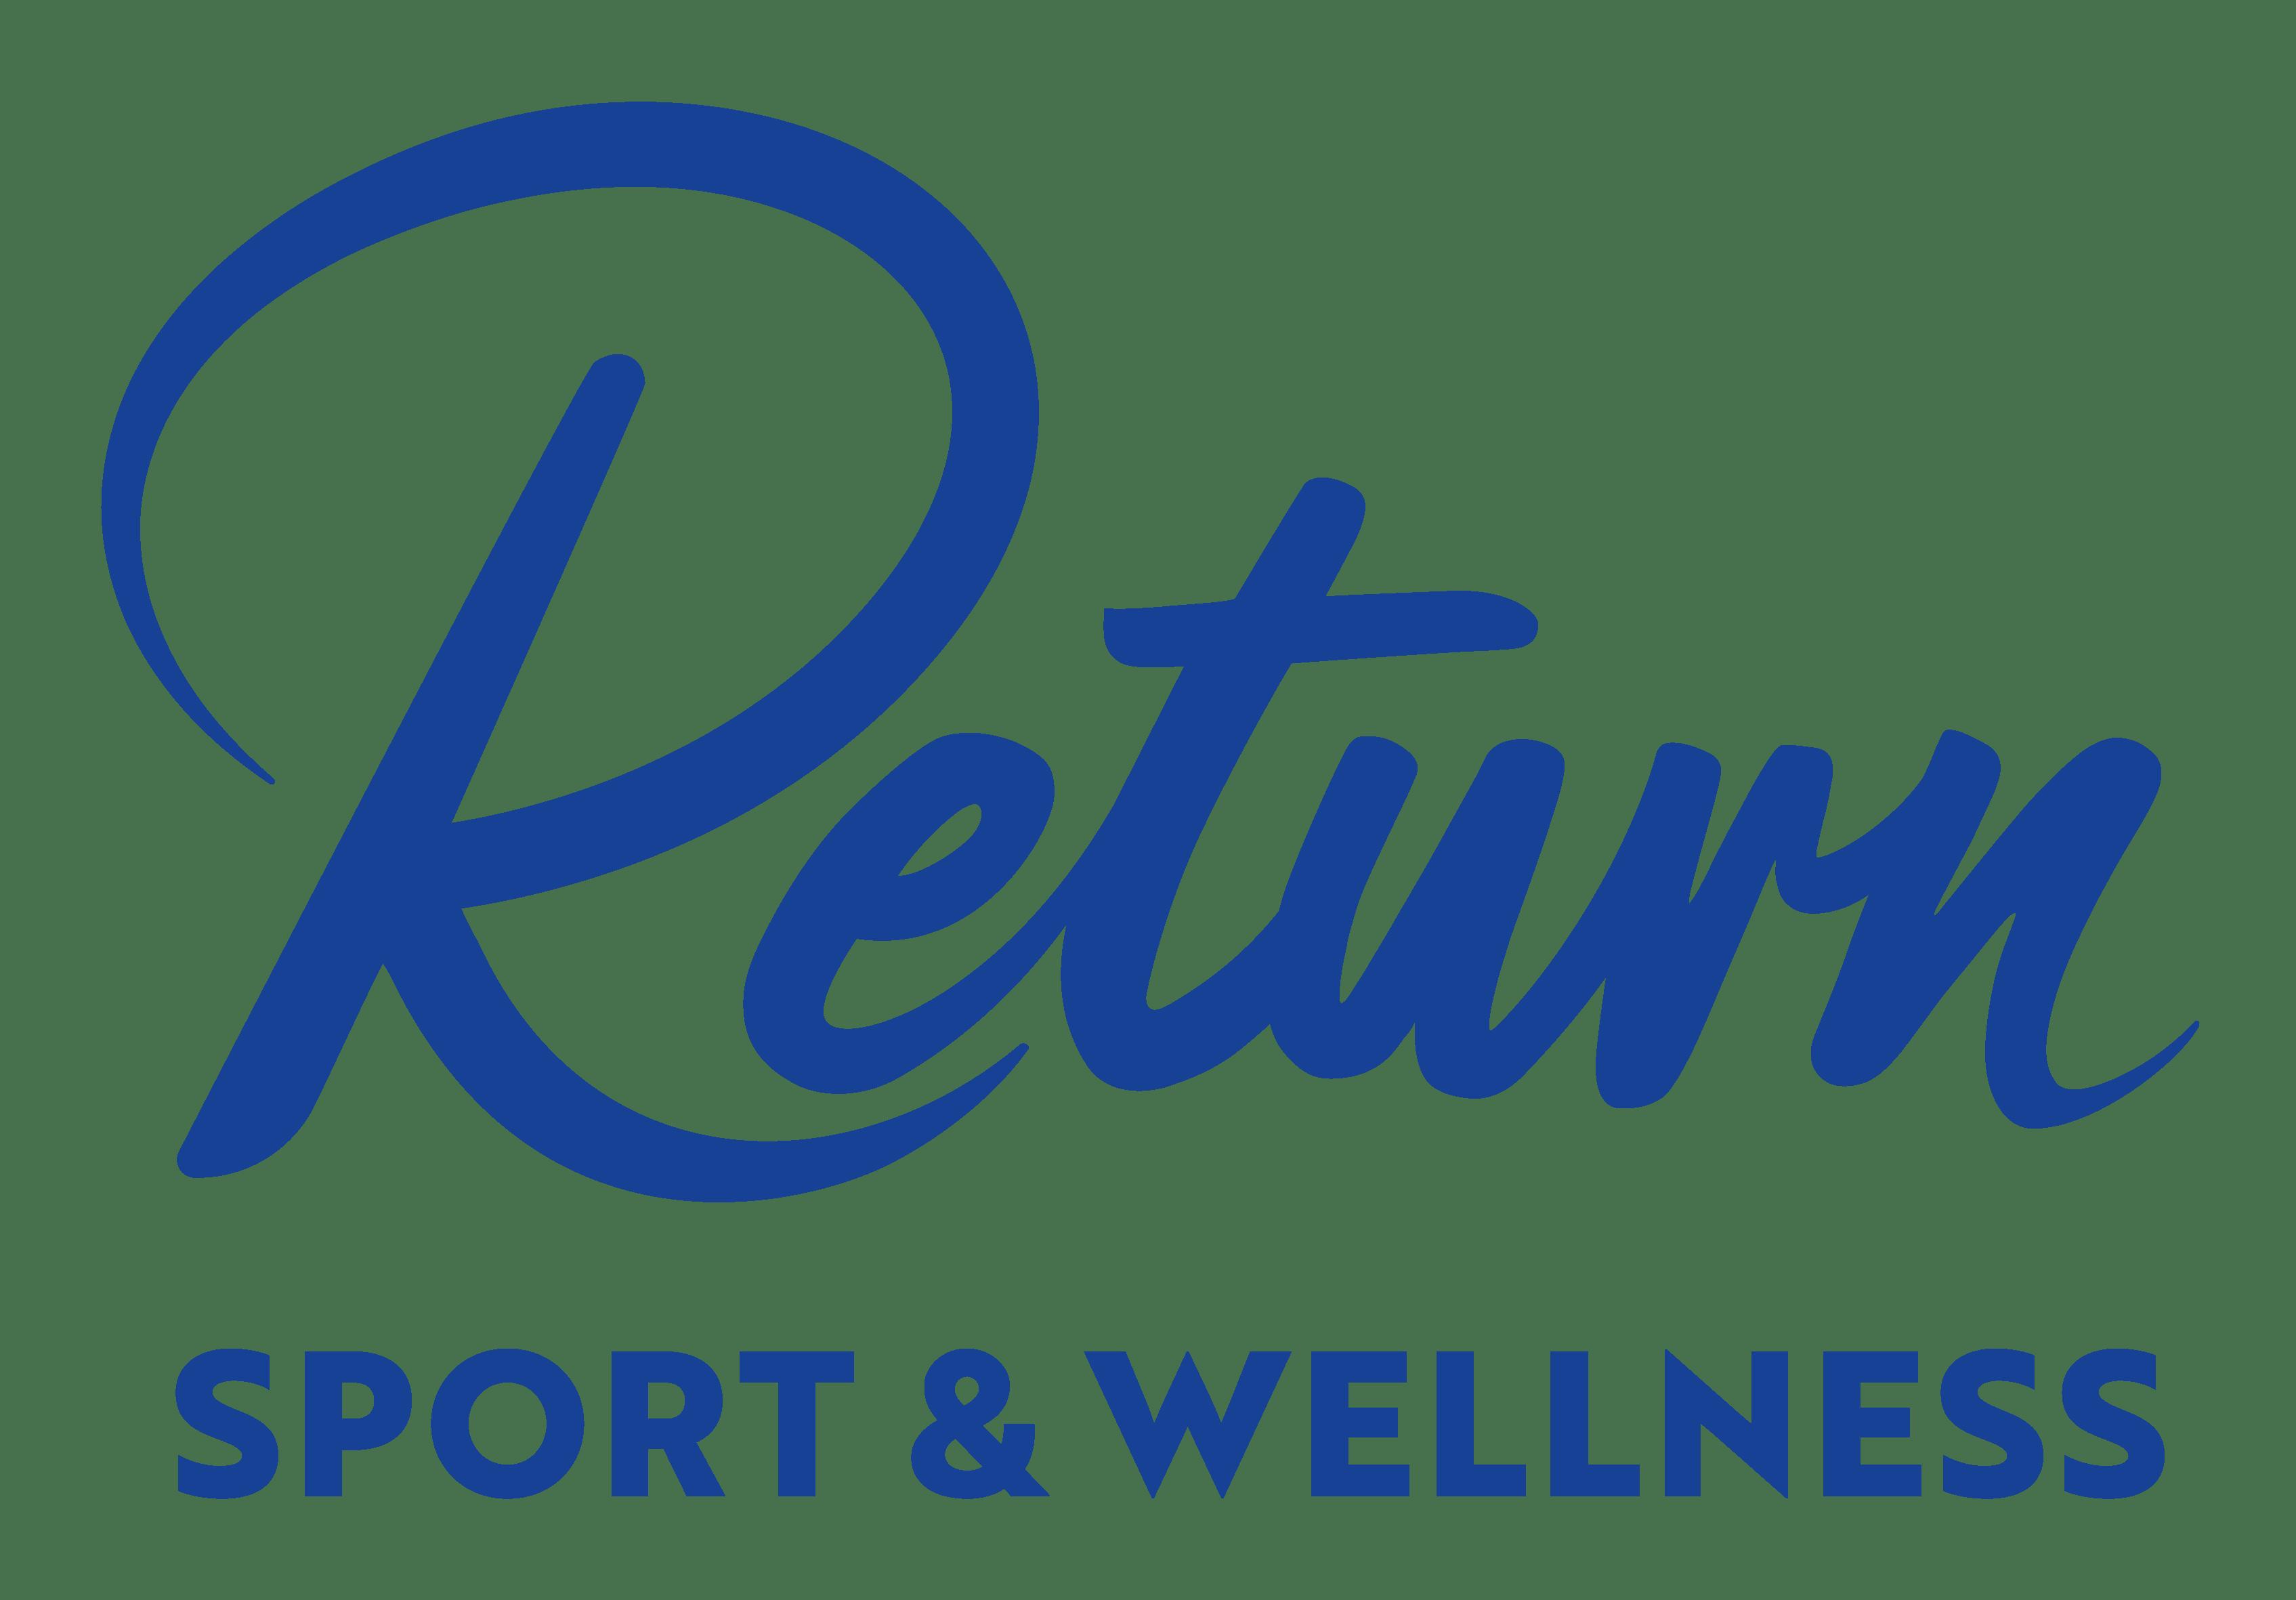 Return Sport & Wellness